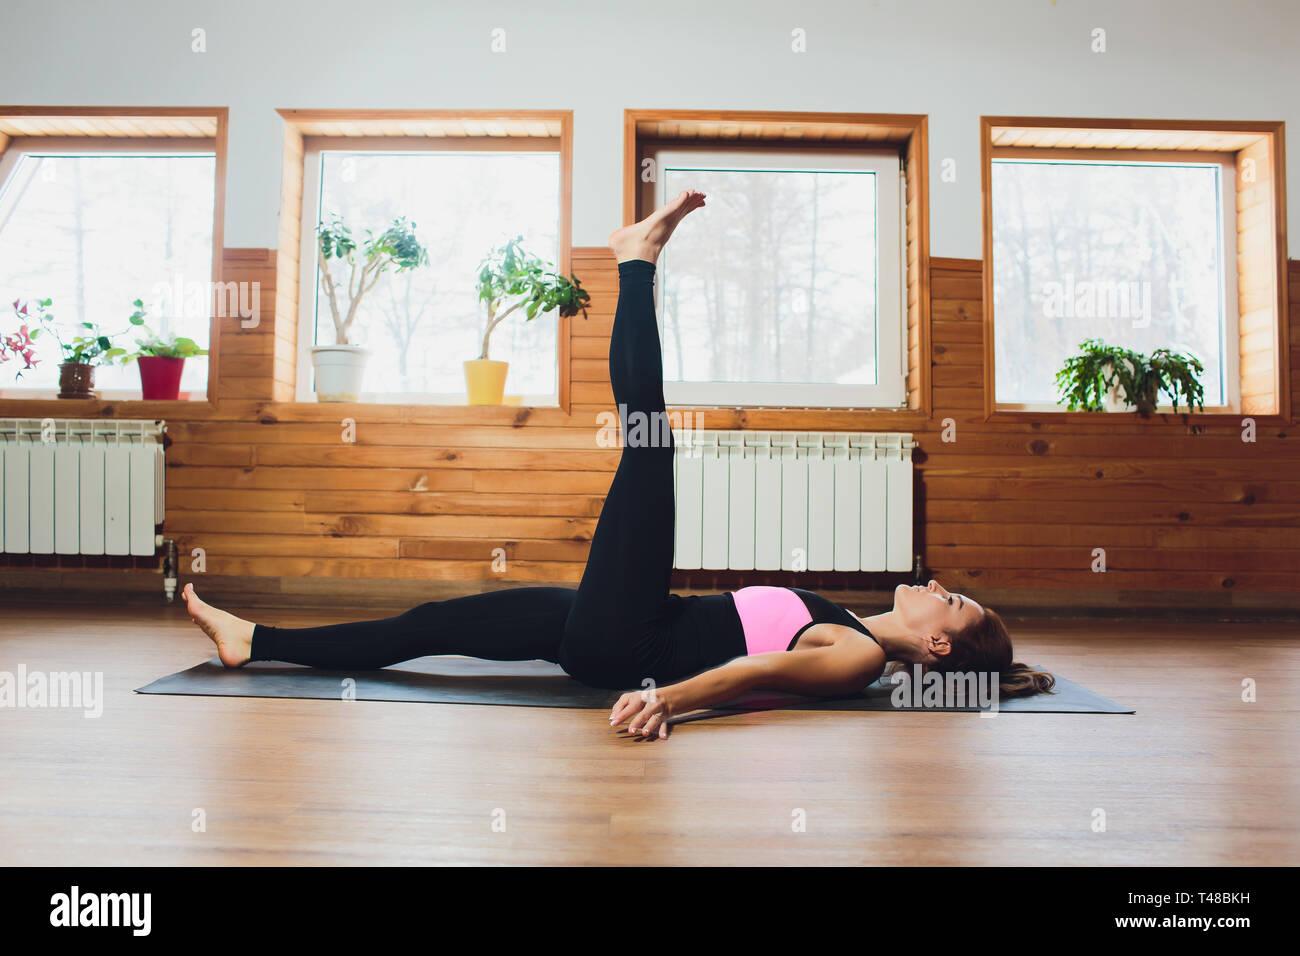 Young yogi sporty woman working out, warming up using yogic belt, lying in yoga Supta Padangushthasana, One Leg Lift exercise, reclined variation of - Stock Image